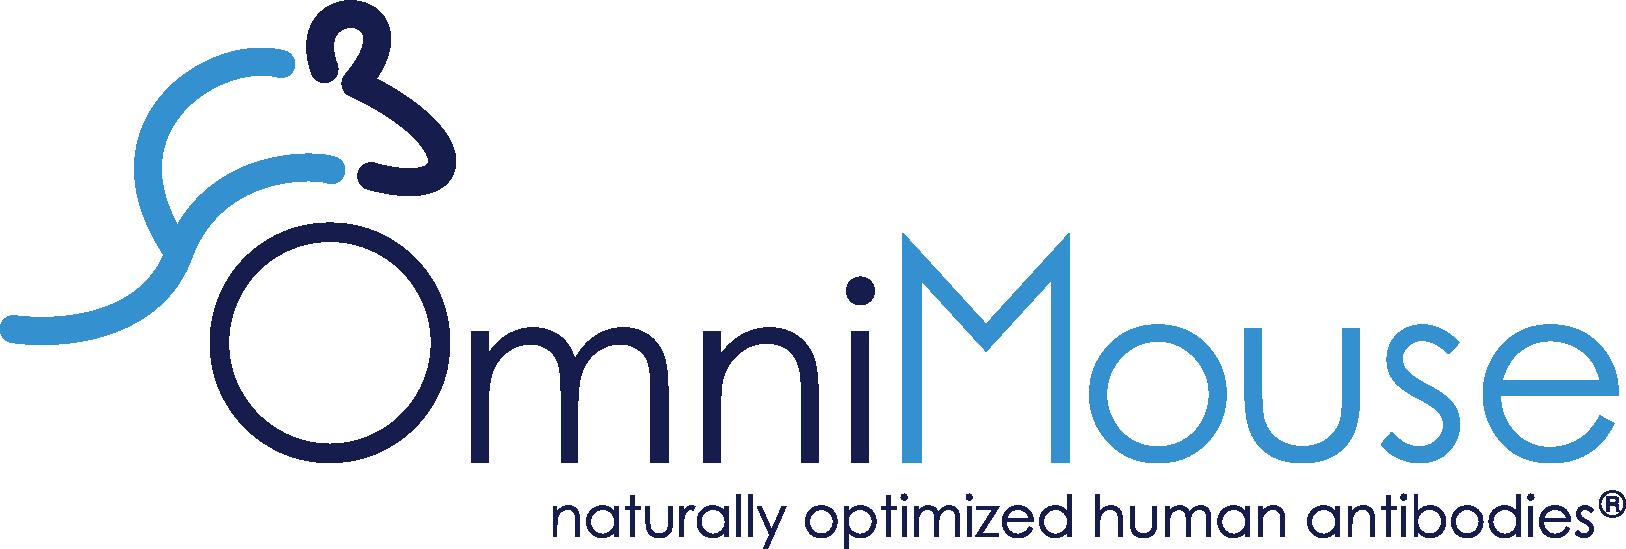 Download omnirat full | Hack Android Devices using Omni RAT  2019-02-02